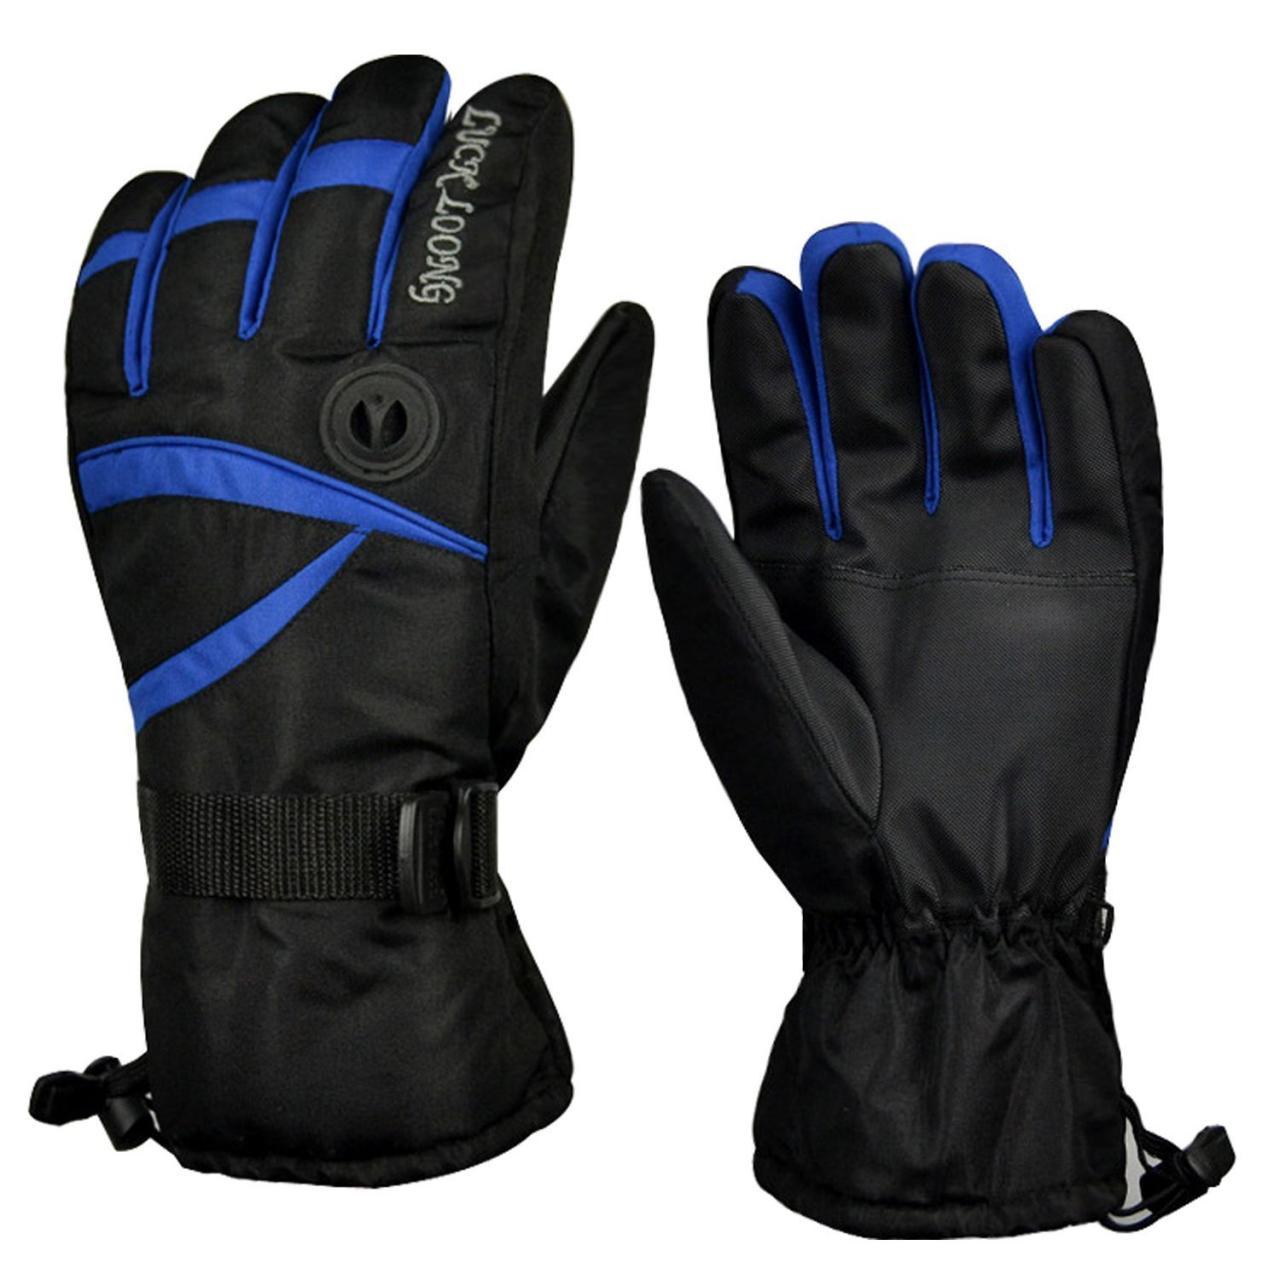 Amazon Gloves 10 คีย์สินค้า ปี 2016 สินค้ากลุ่มนี้กำลังร้อนแรงอยู่ในช่วงเวลานี้! นักขาย Amazon จะรออะไรคลิกดูกันเลย :)